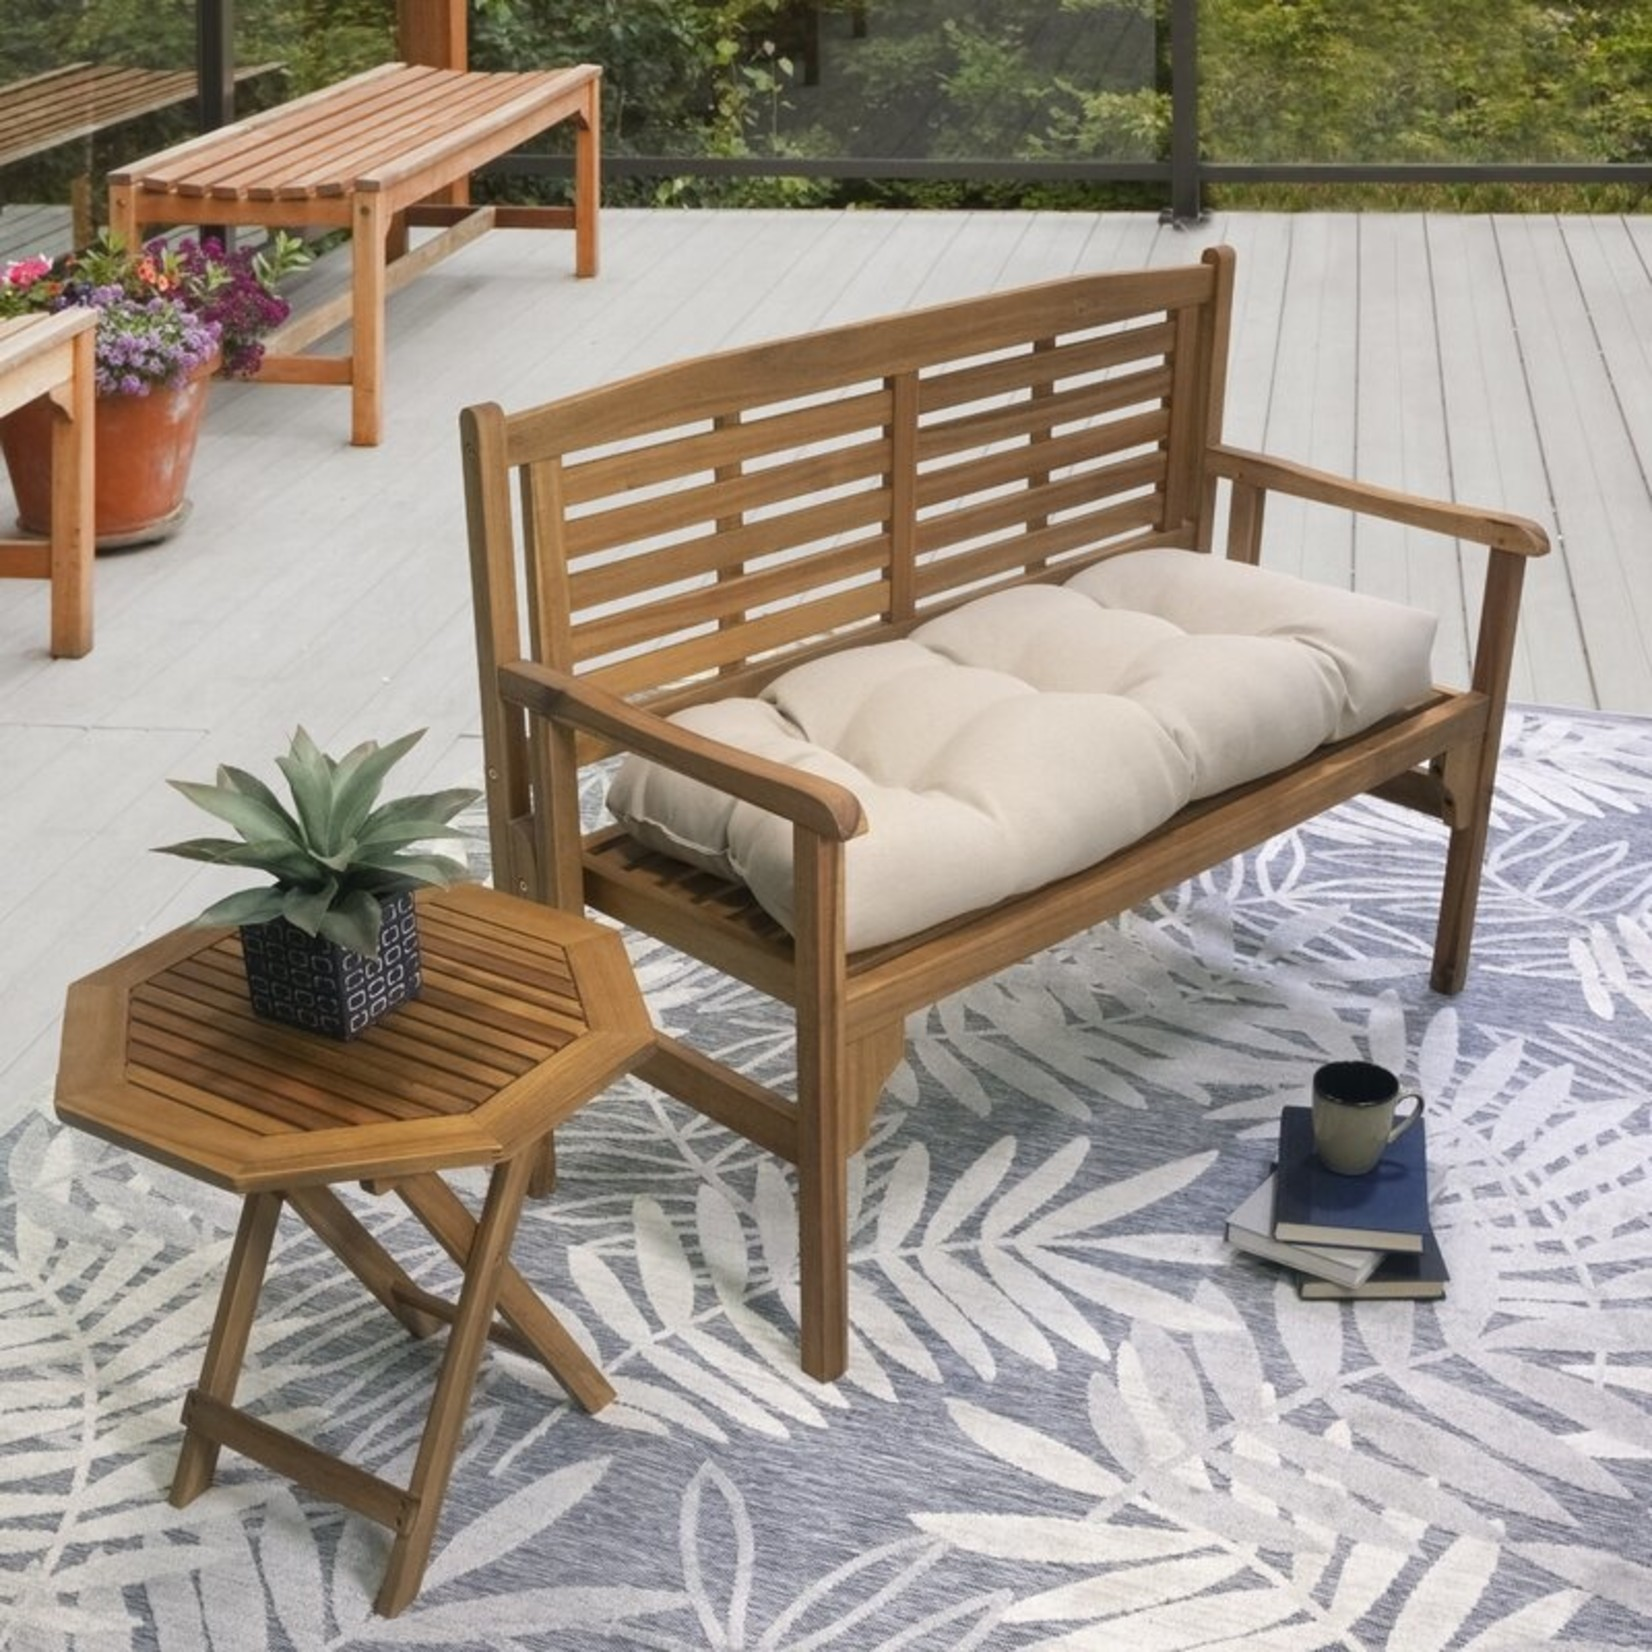 *Sarver Indoor/Outdoor Seat Cushion - Tan